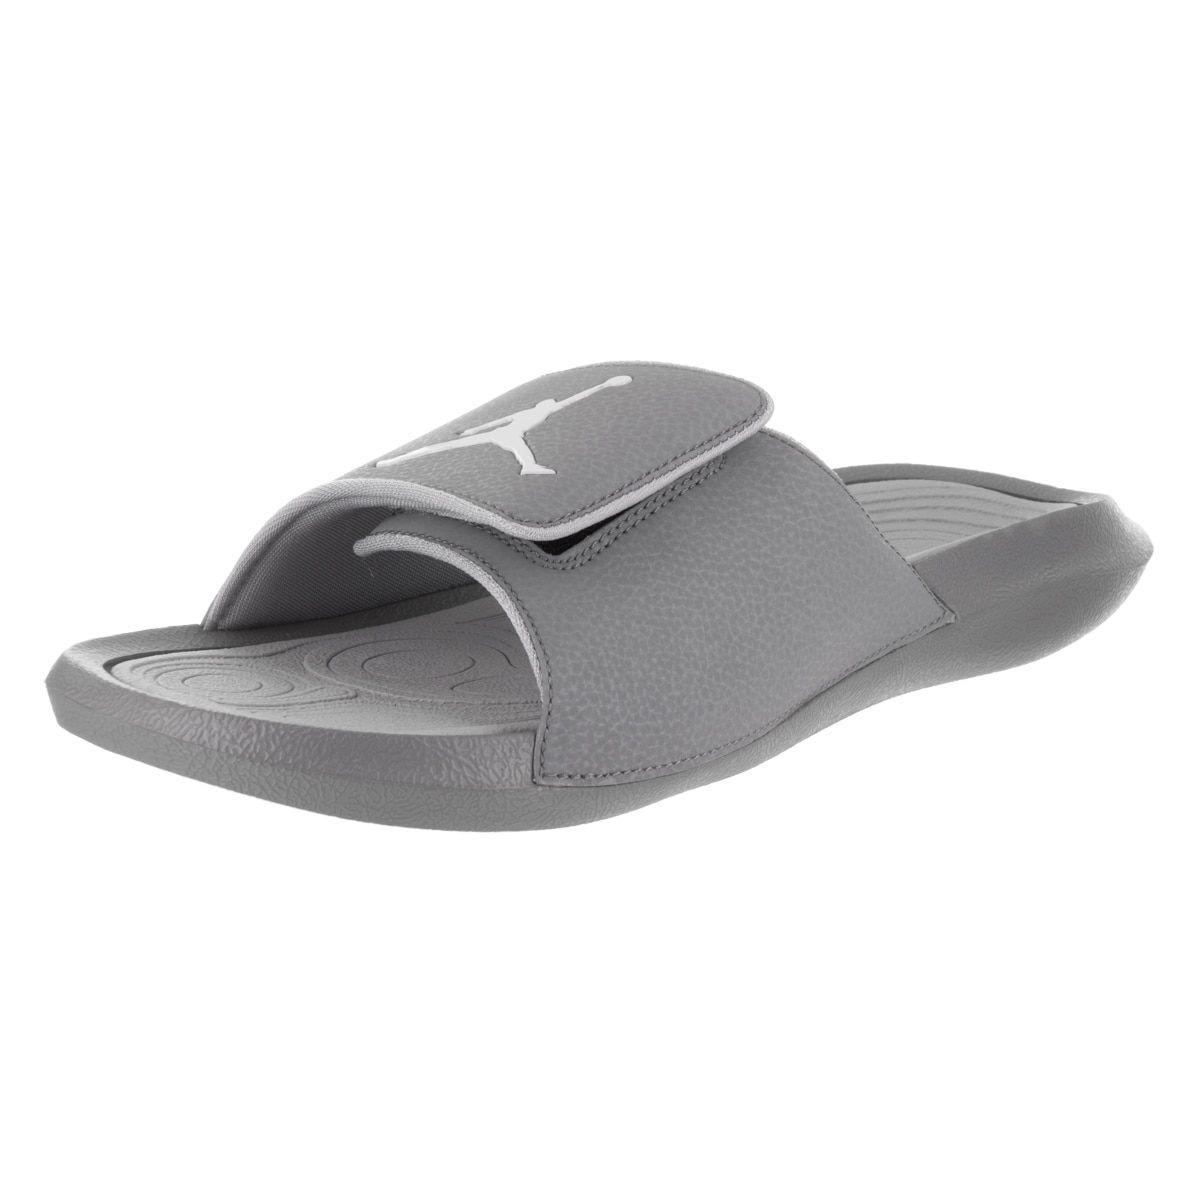 187812fdcd0a Nike Jordan Men s Jordan Hydro 6 Sandal 10 Men US